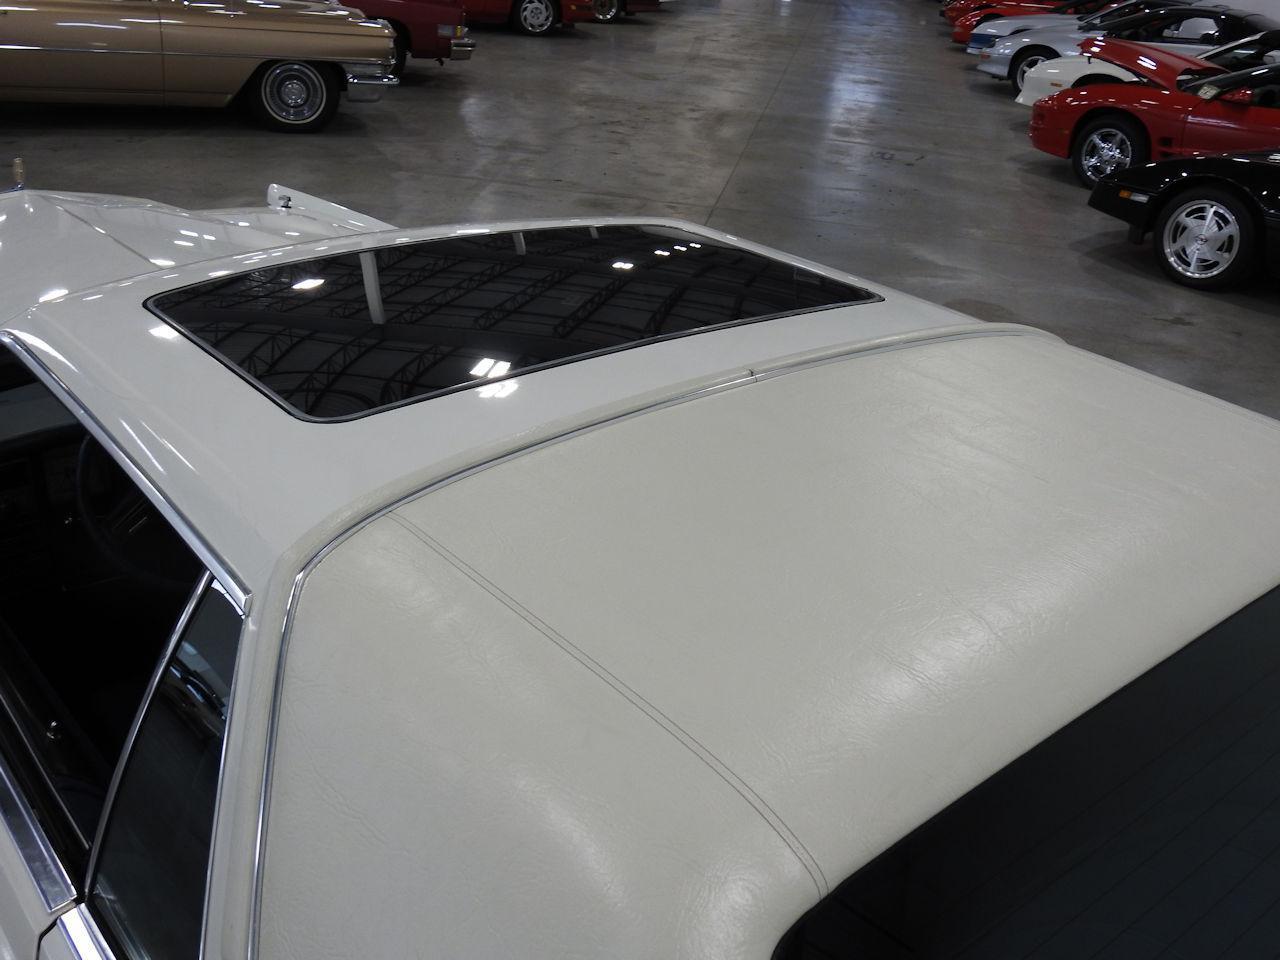 1979 Lincoln MKV 50